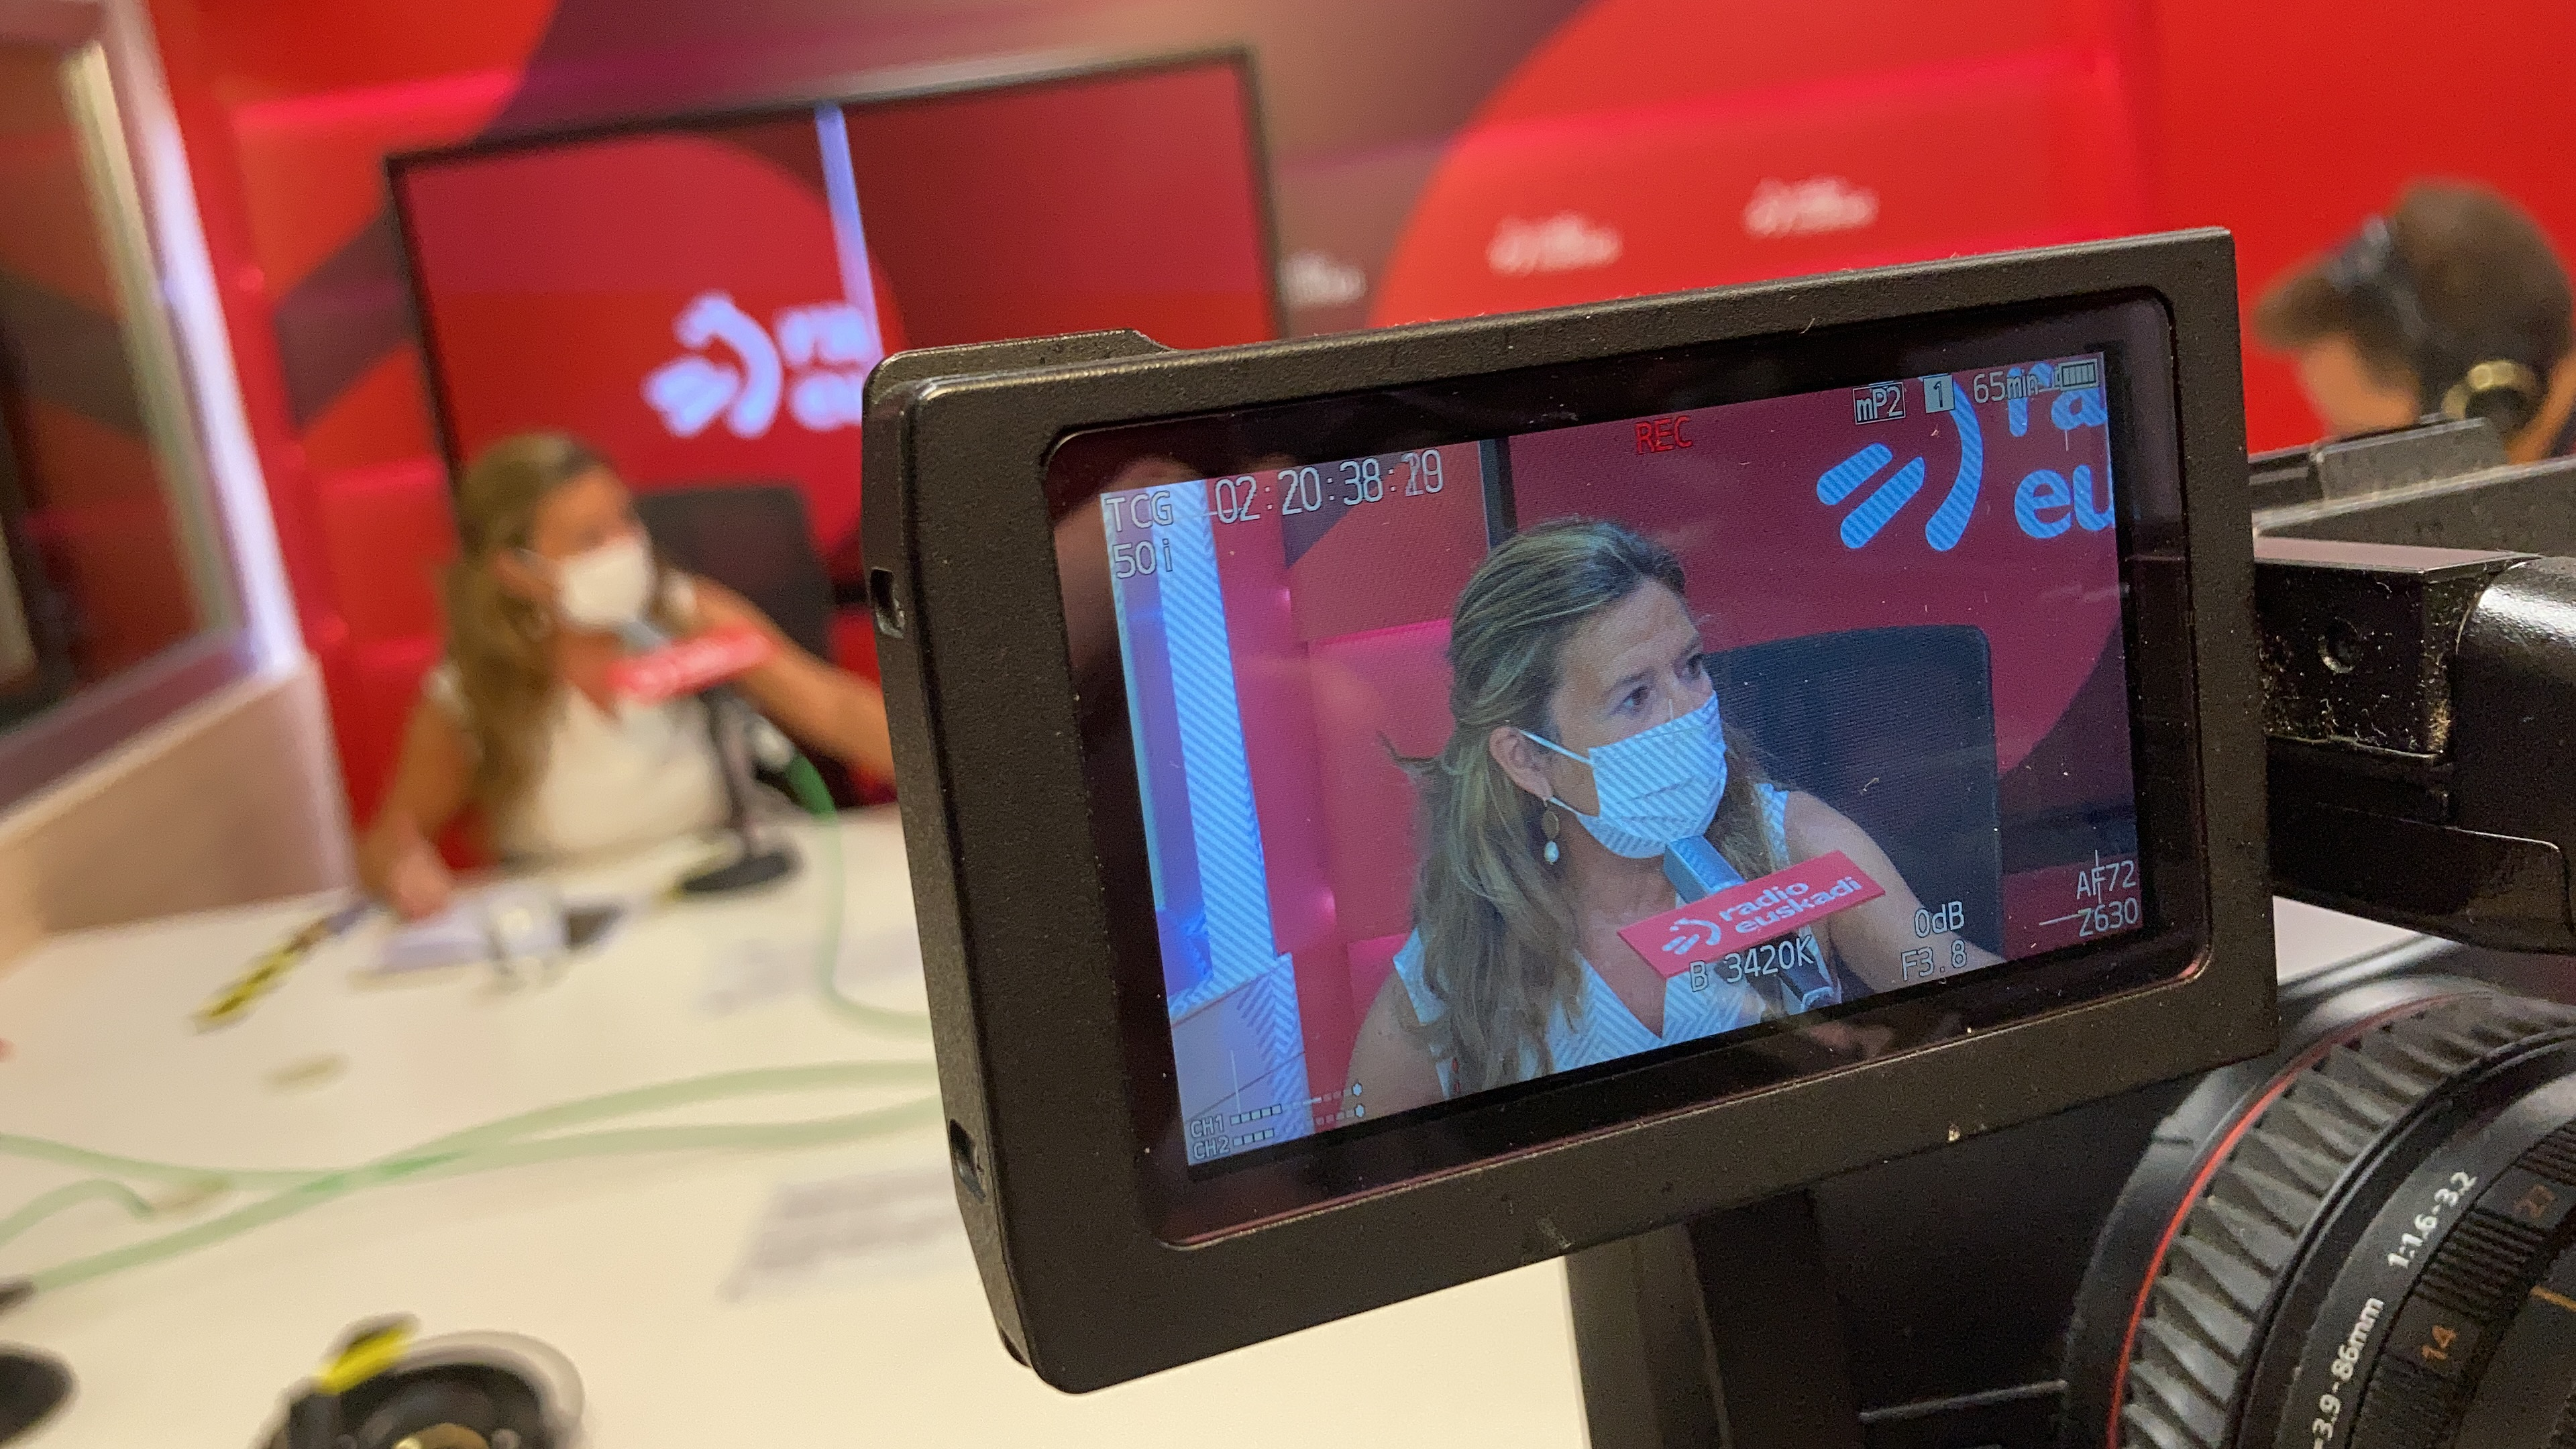 Sagardui_Radio_Euskadi_01.jpg